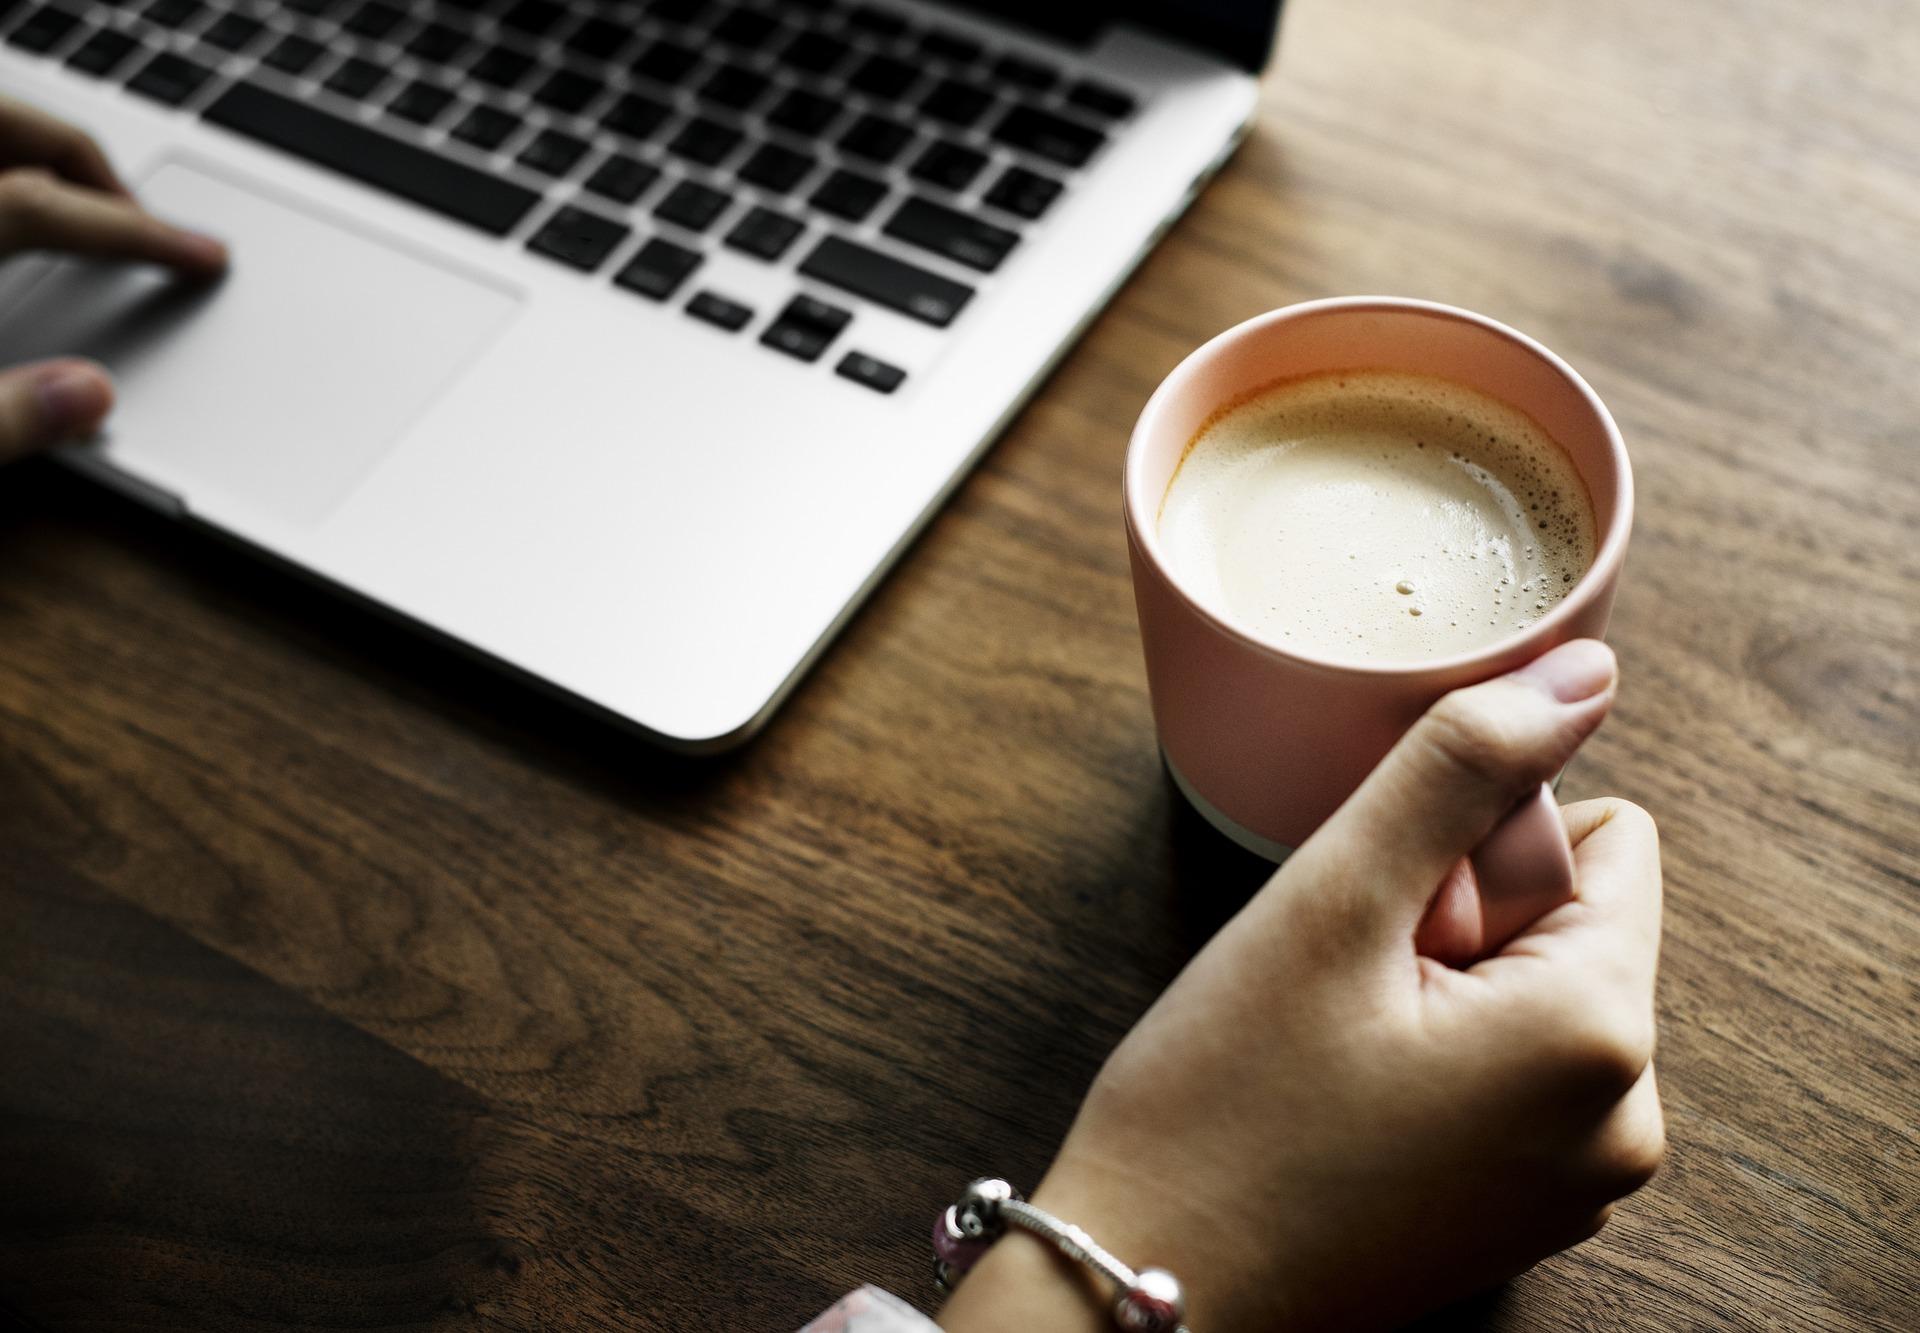 work life balance - how to maintain a better work life balance